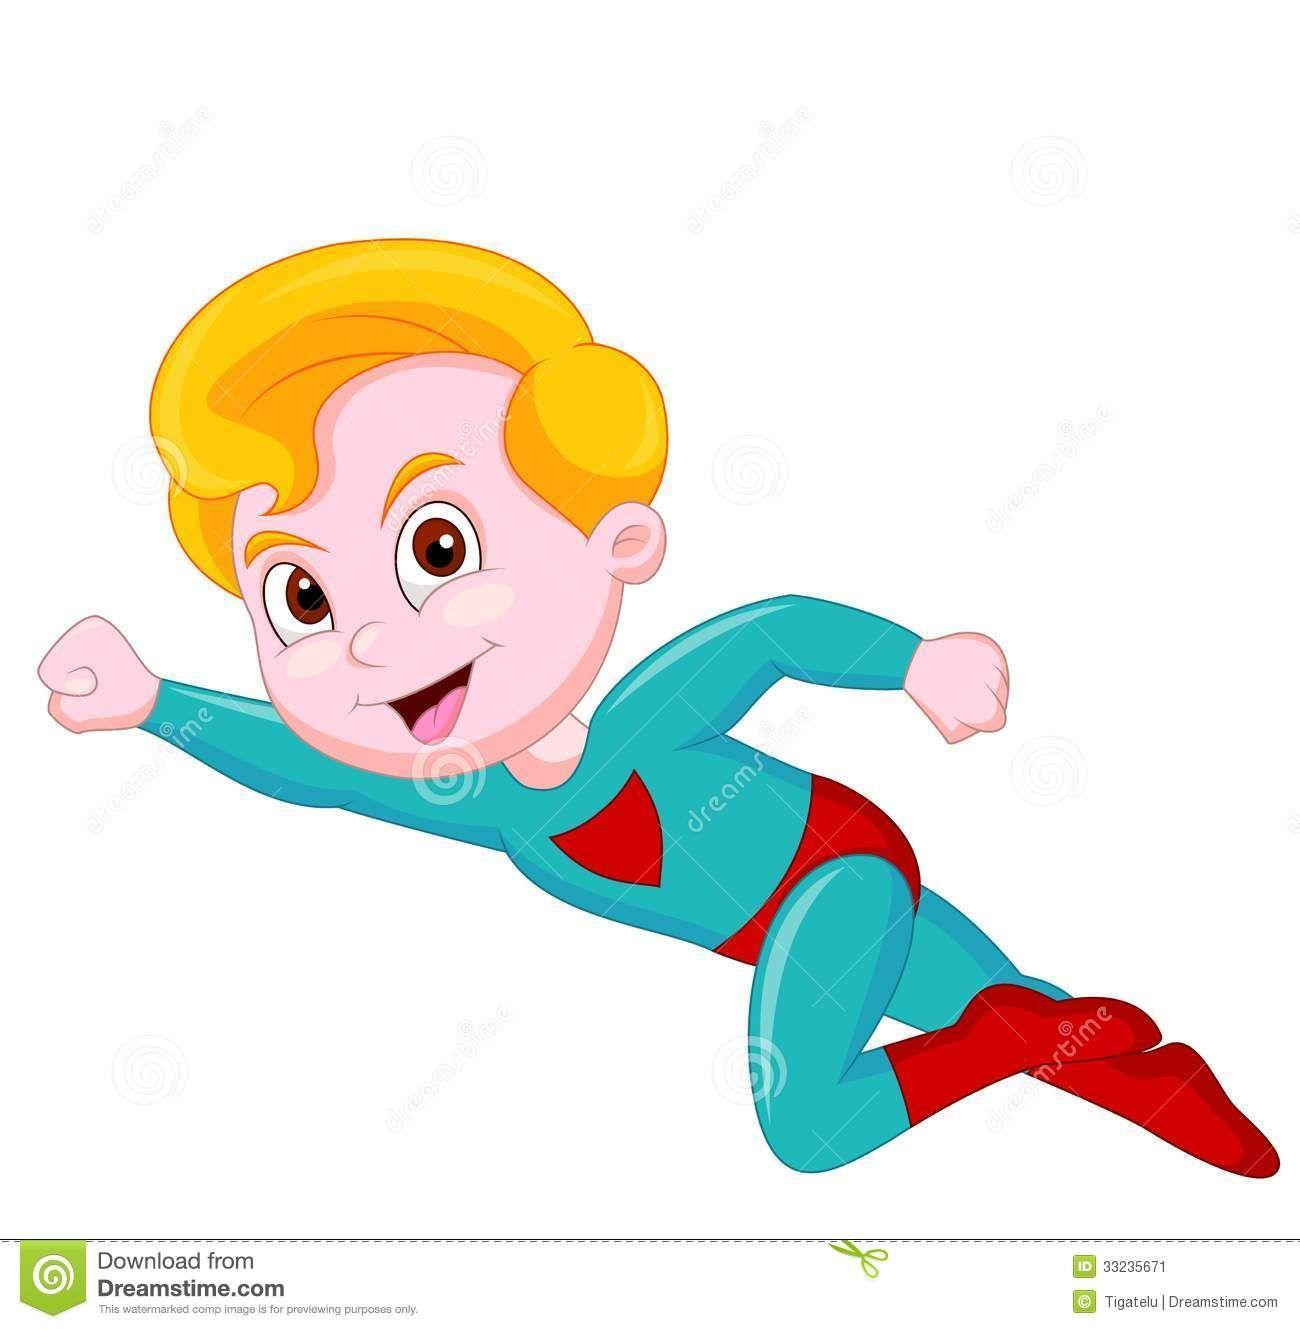 kid cartoon superheroes - Google Search | Super Heros kid cartoons ...